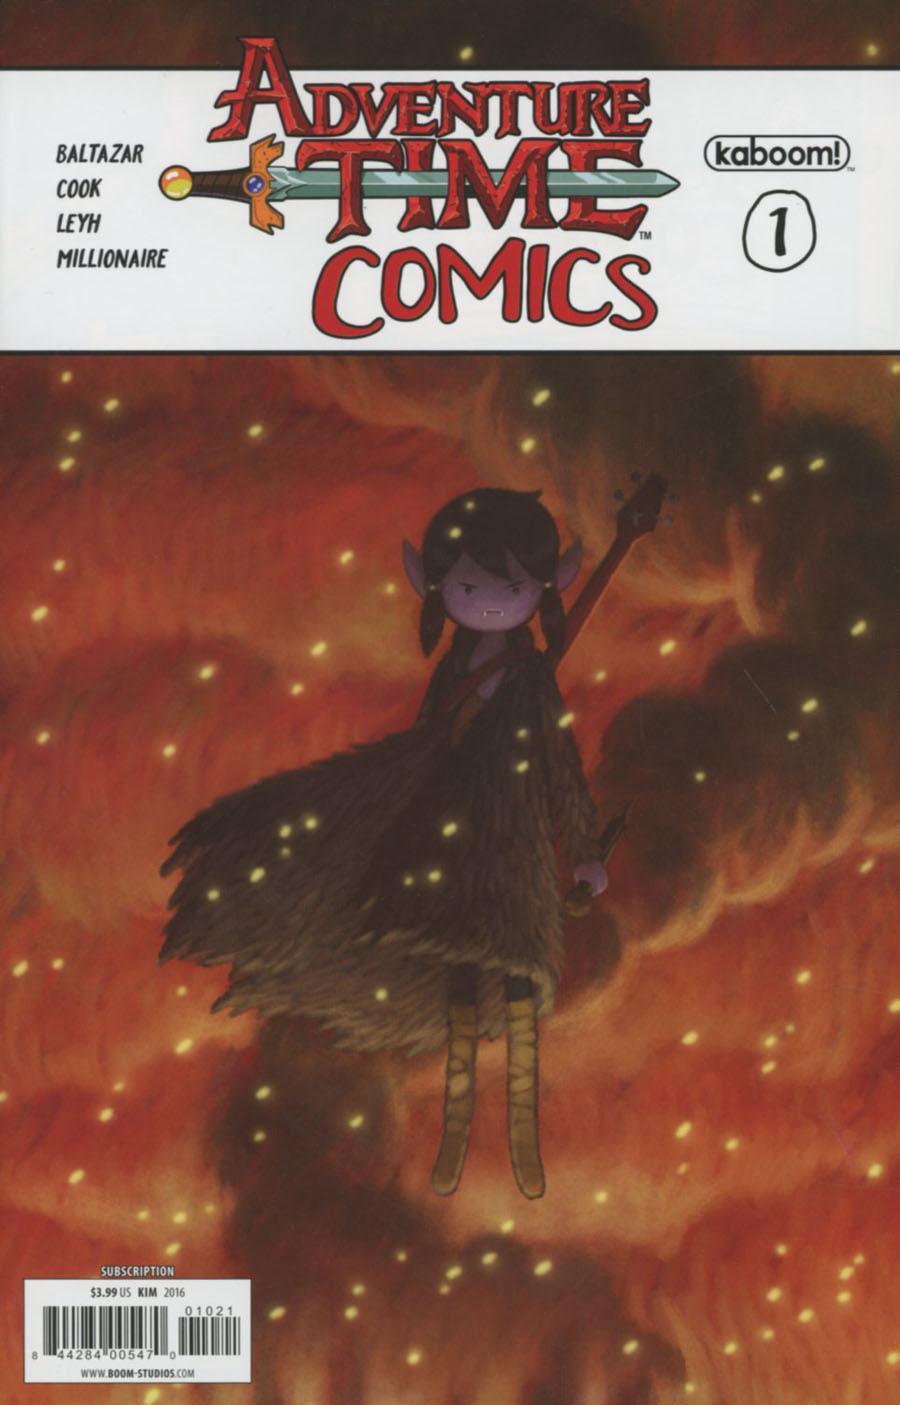 Adventure Time Comics #1 Cover B Variant Derek Kirk Kim Subscription Cover